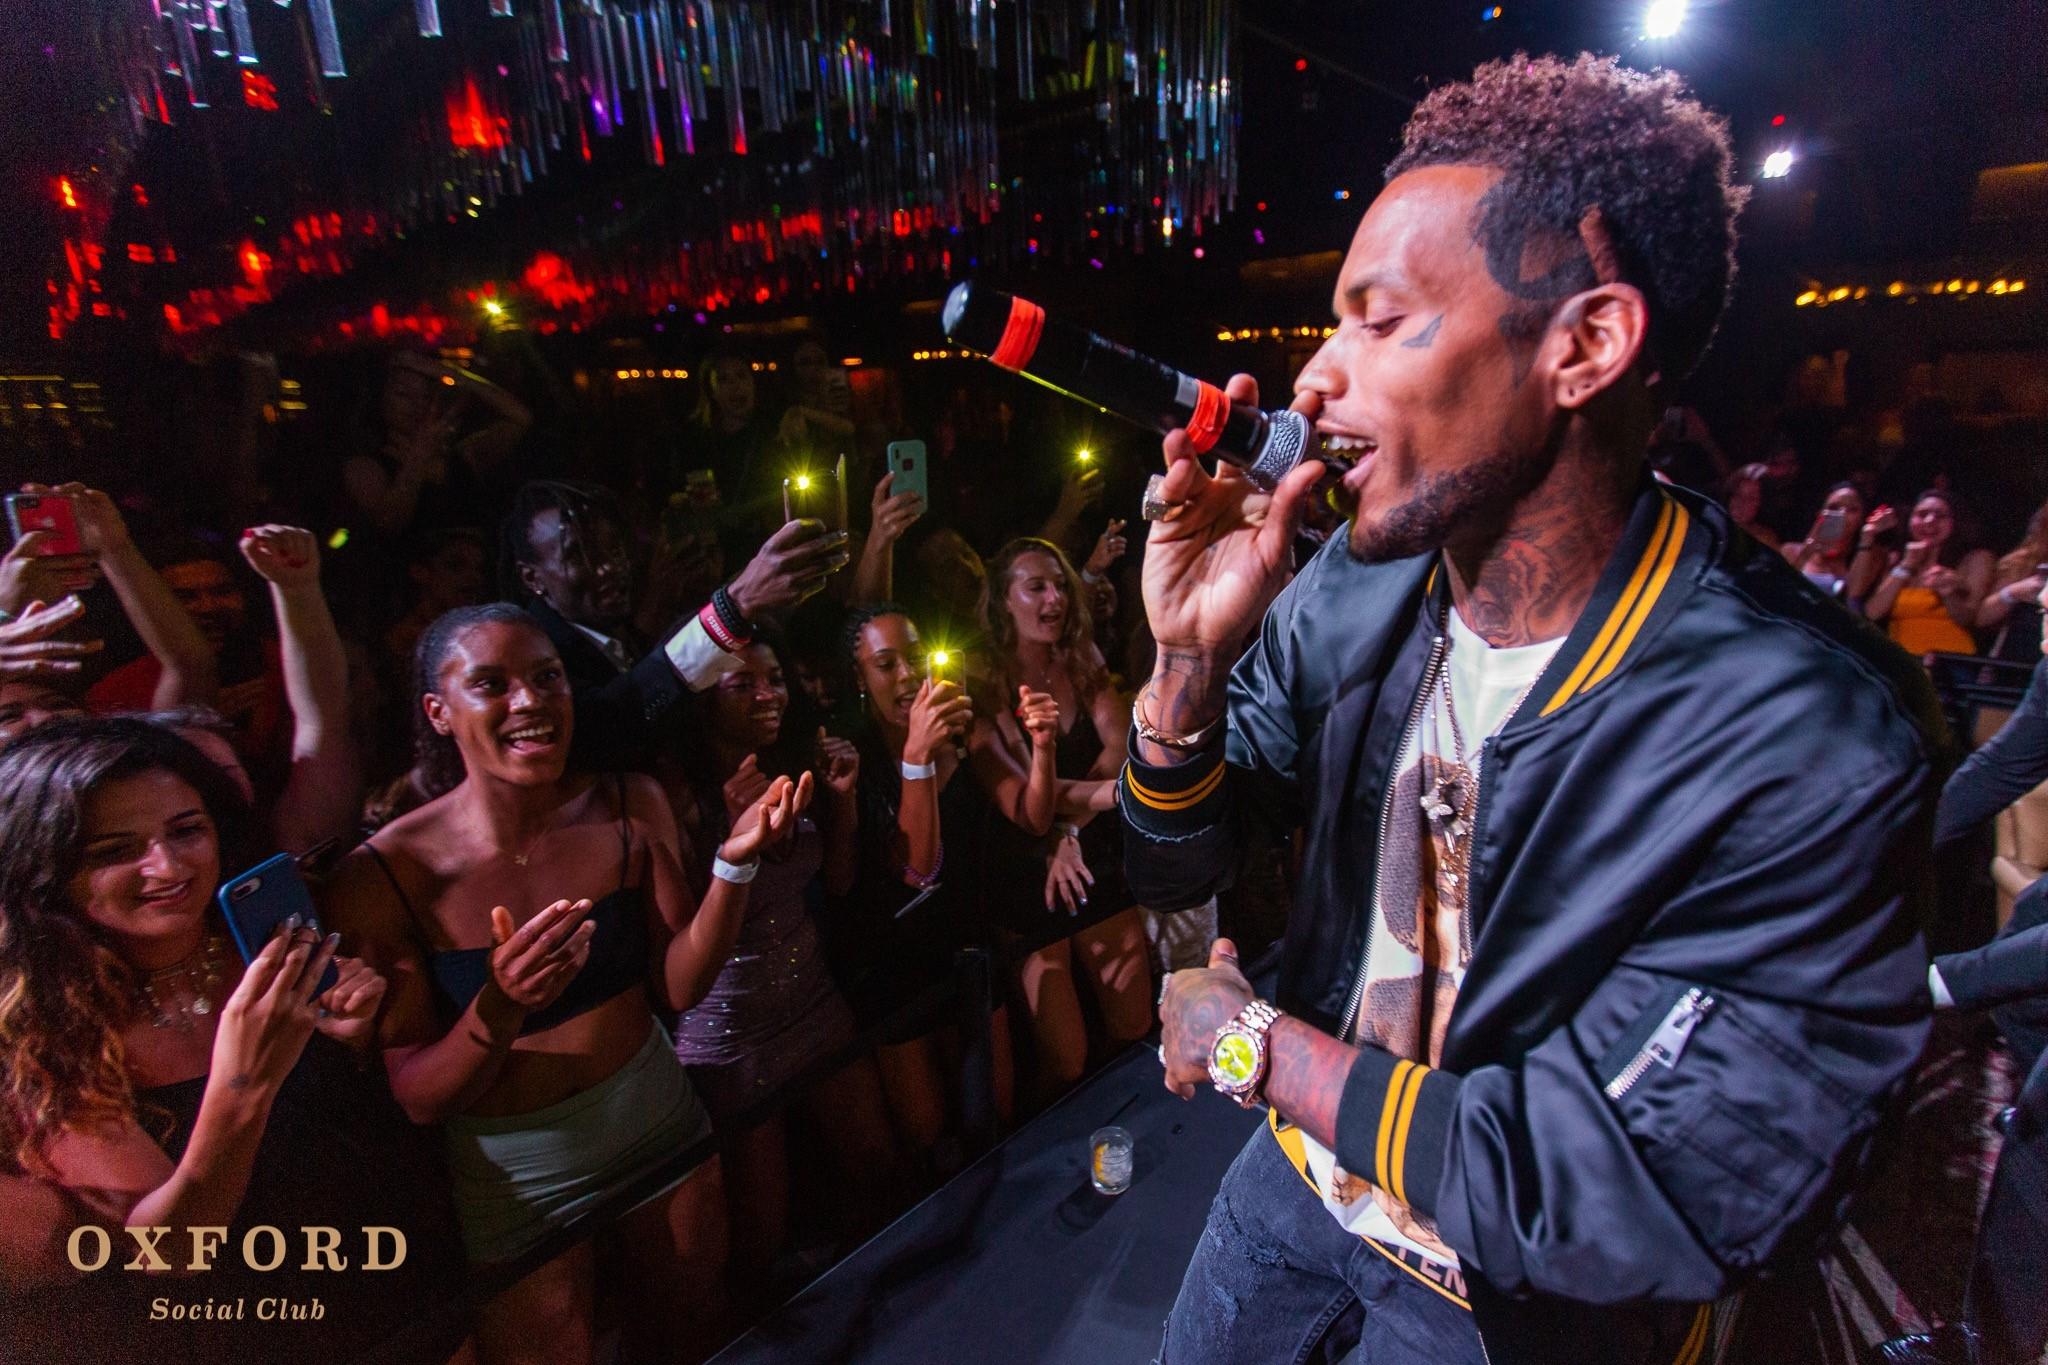 Singer at oxford social club